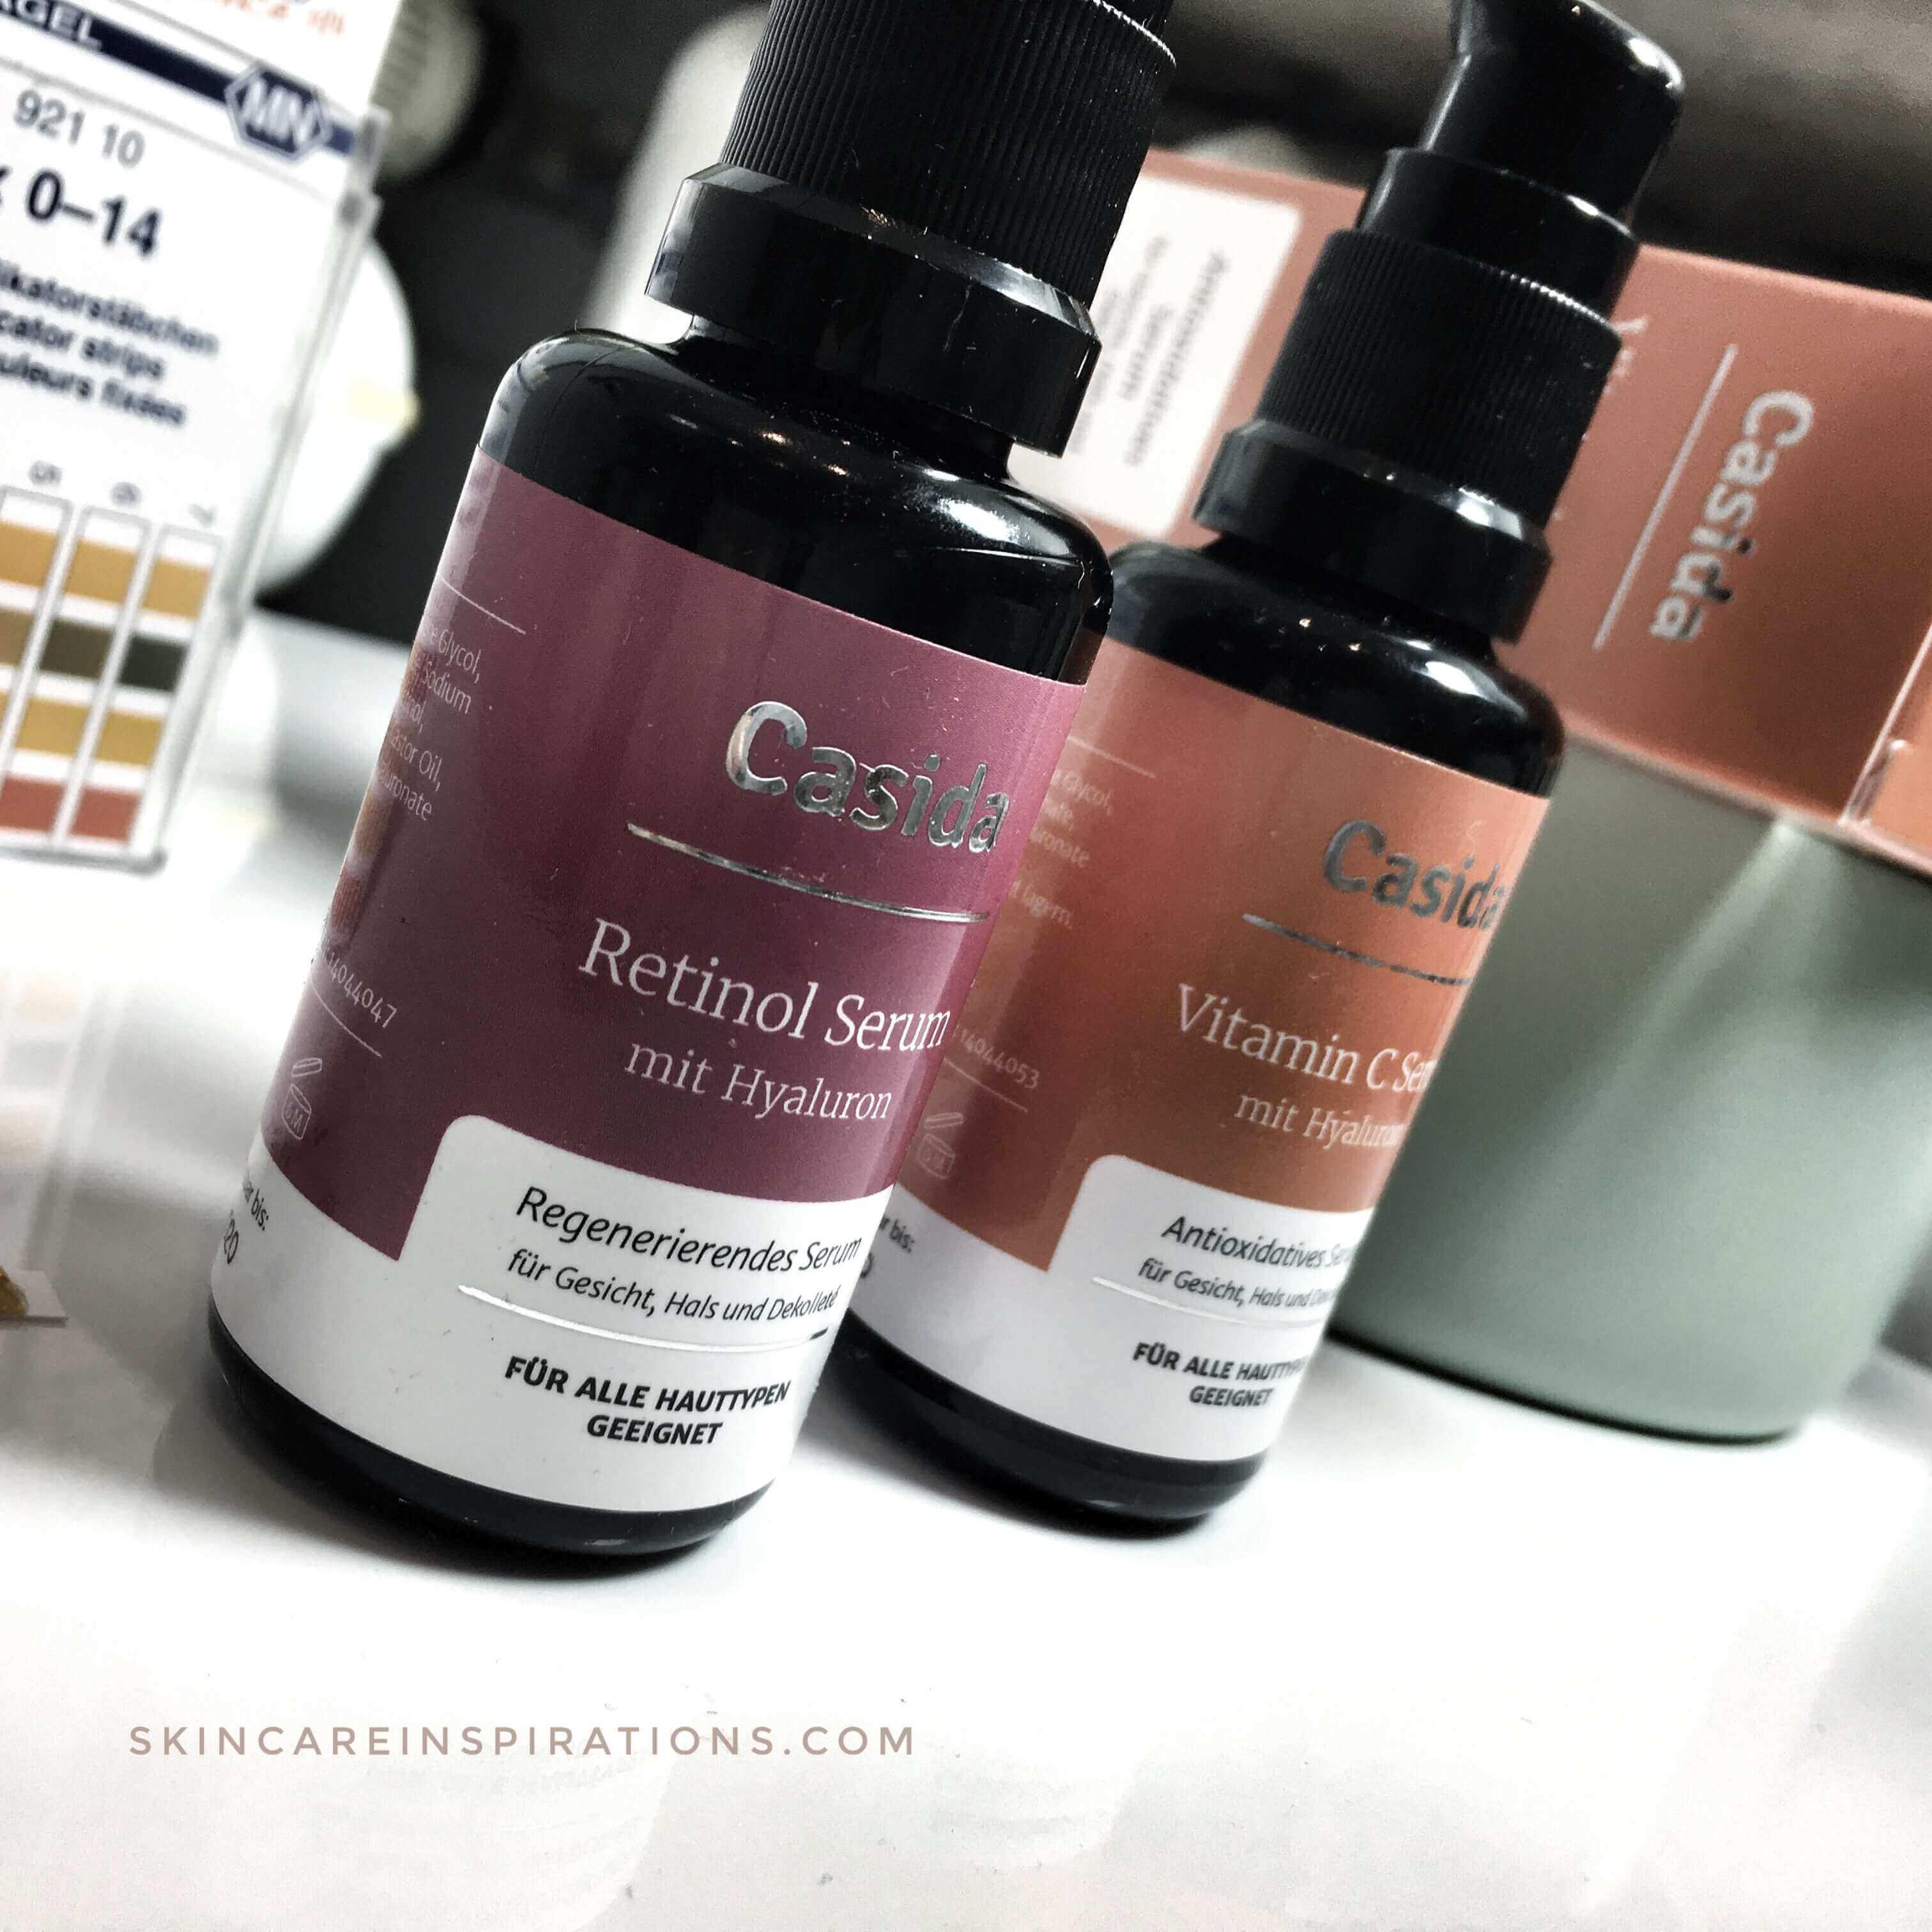 Casida Seren Vitamin C Retinol